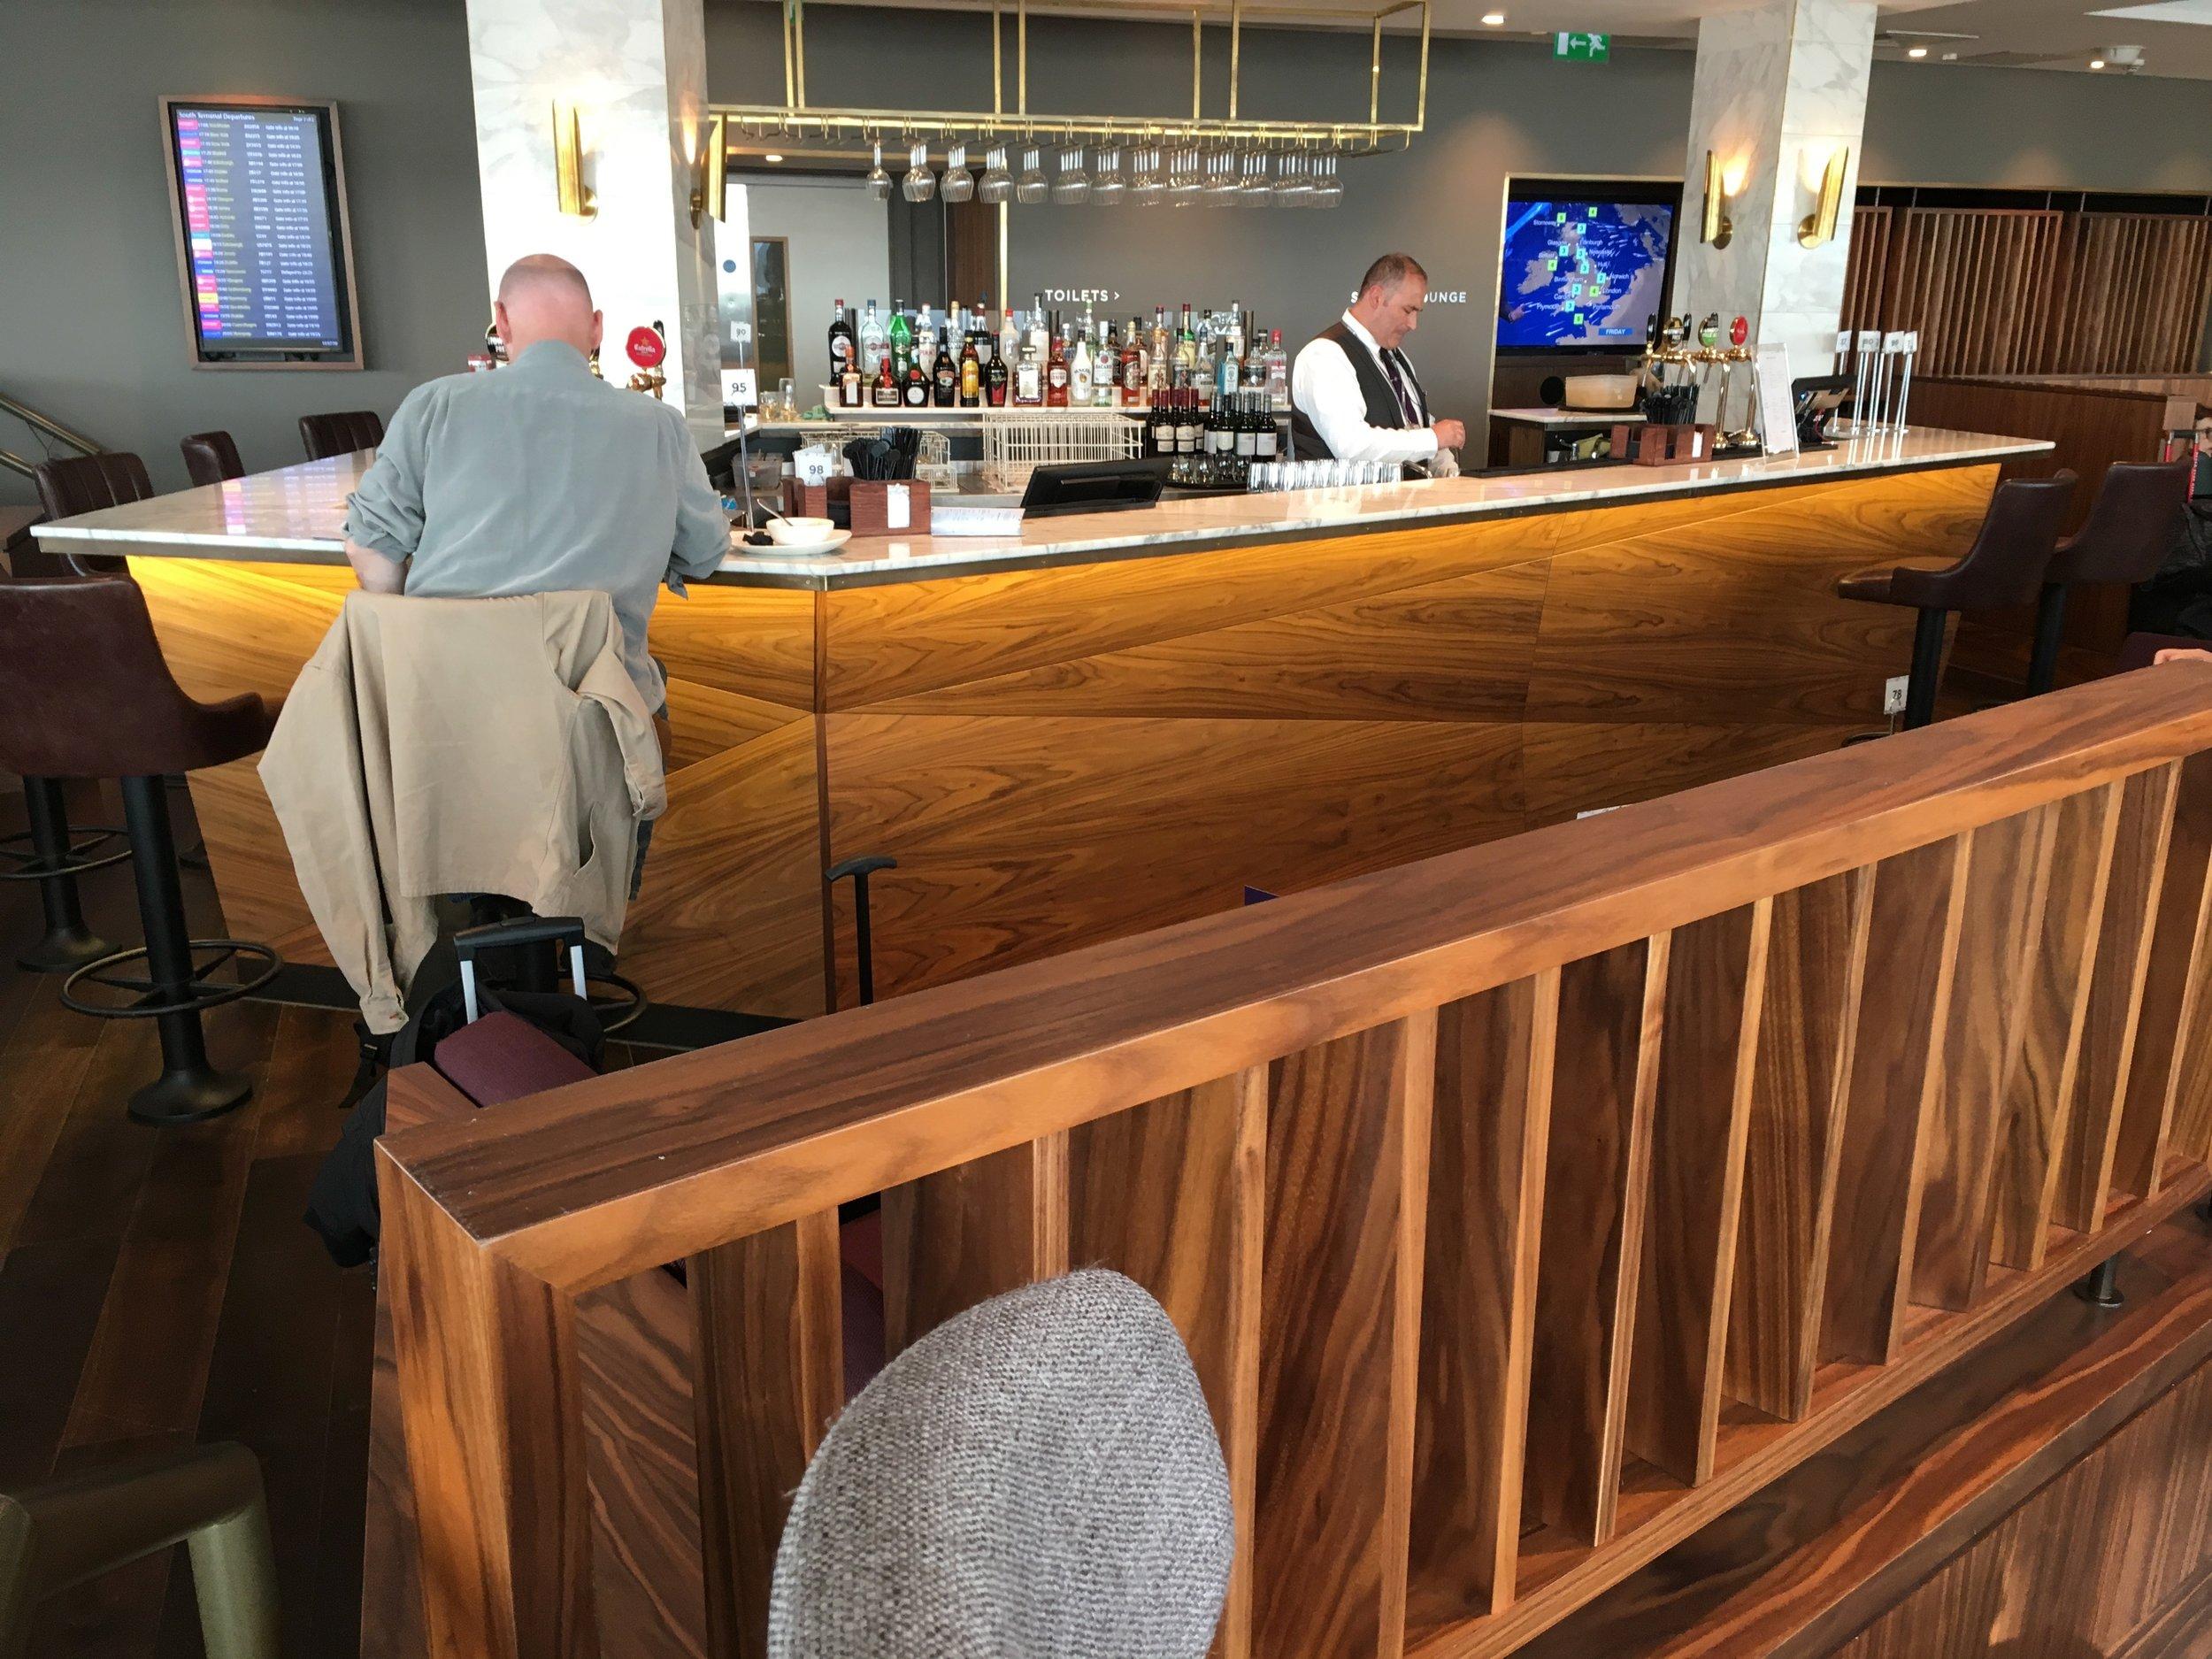 Staffed full-service bar